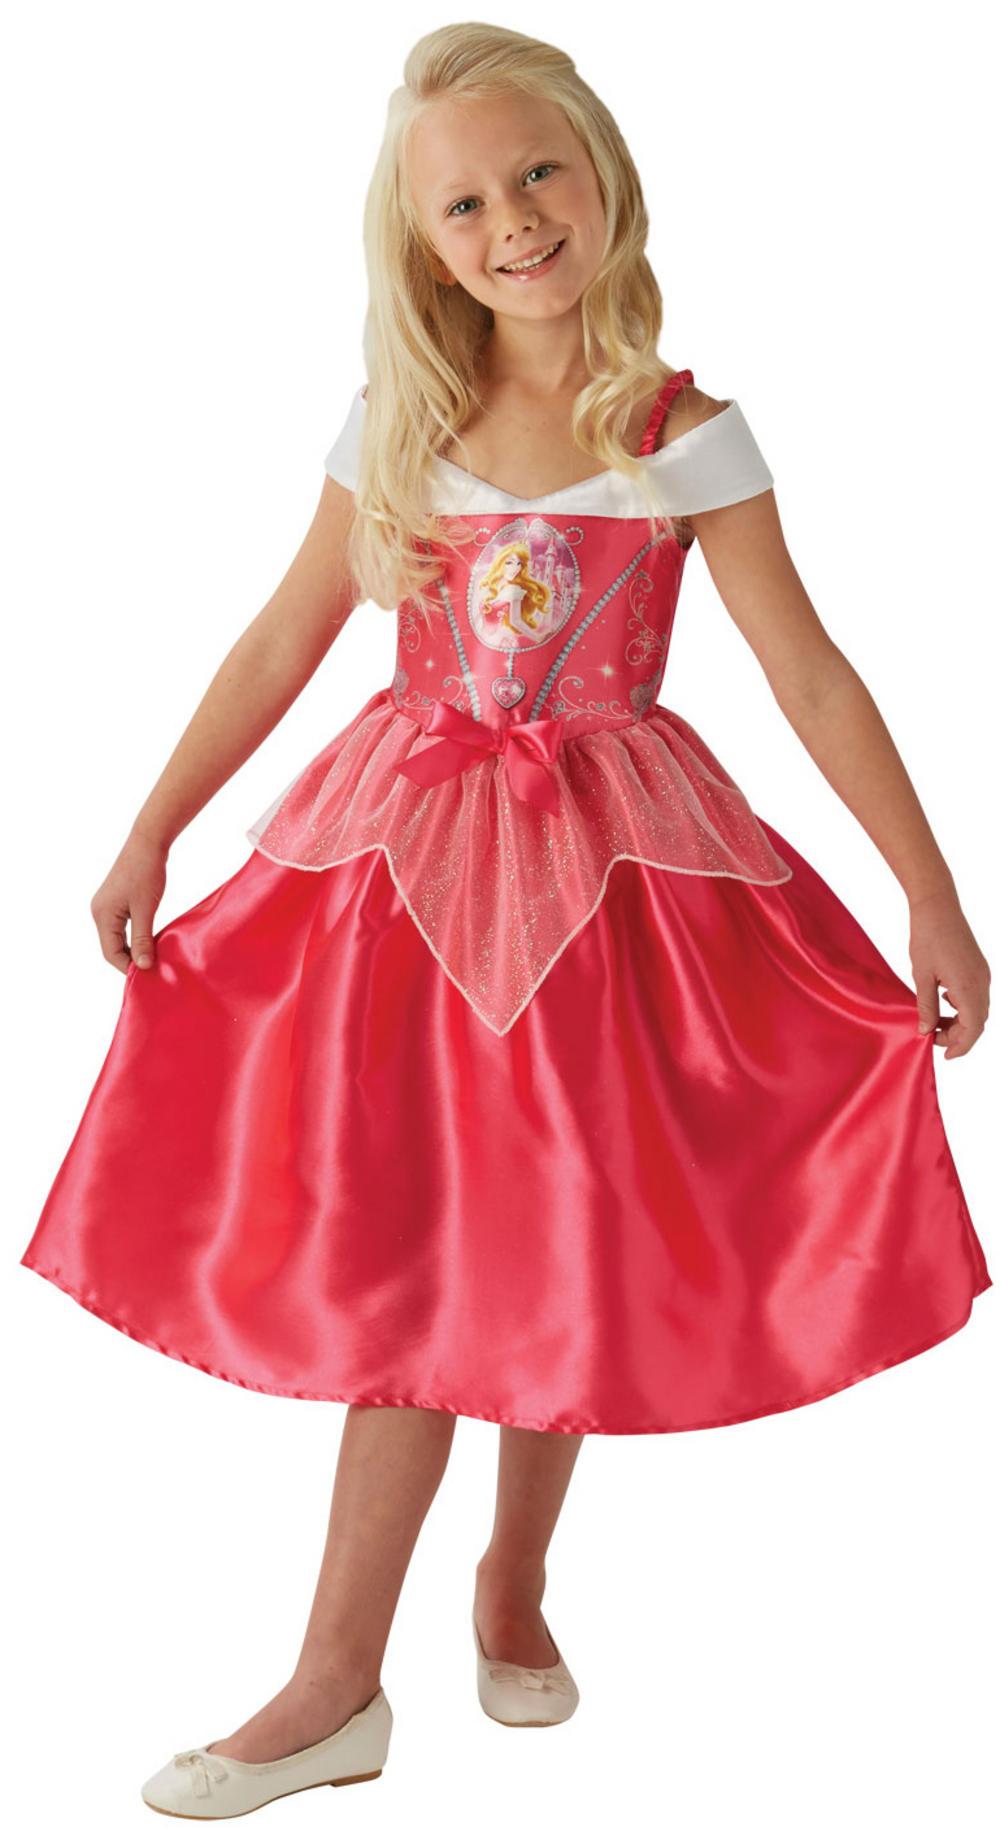 Fairytale Sleeping Beauty Girls Costume